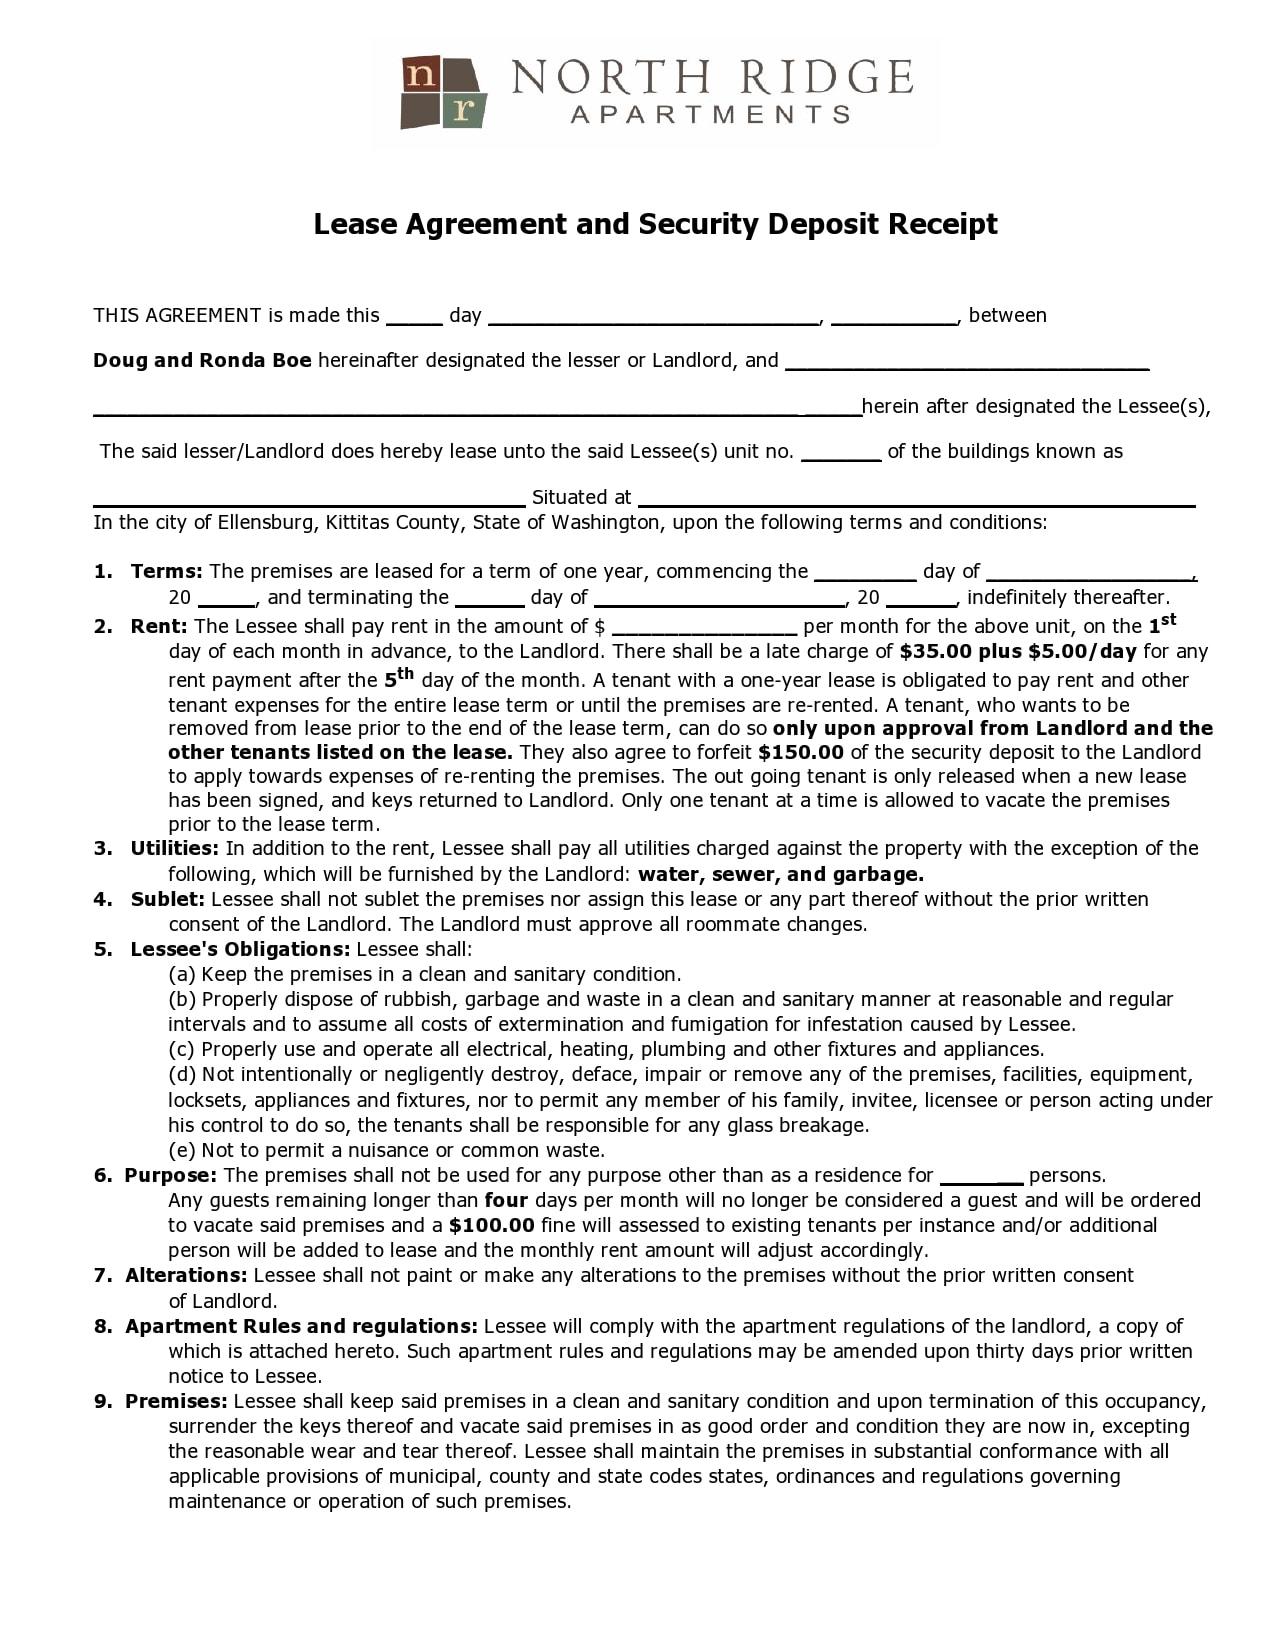 security deposit receipt 02